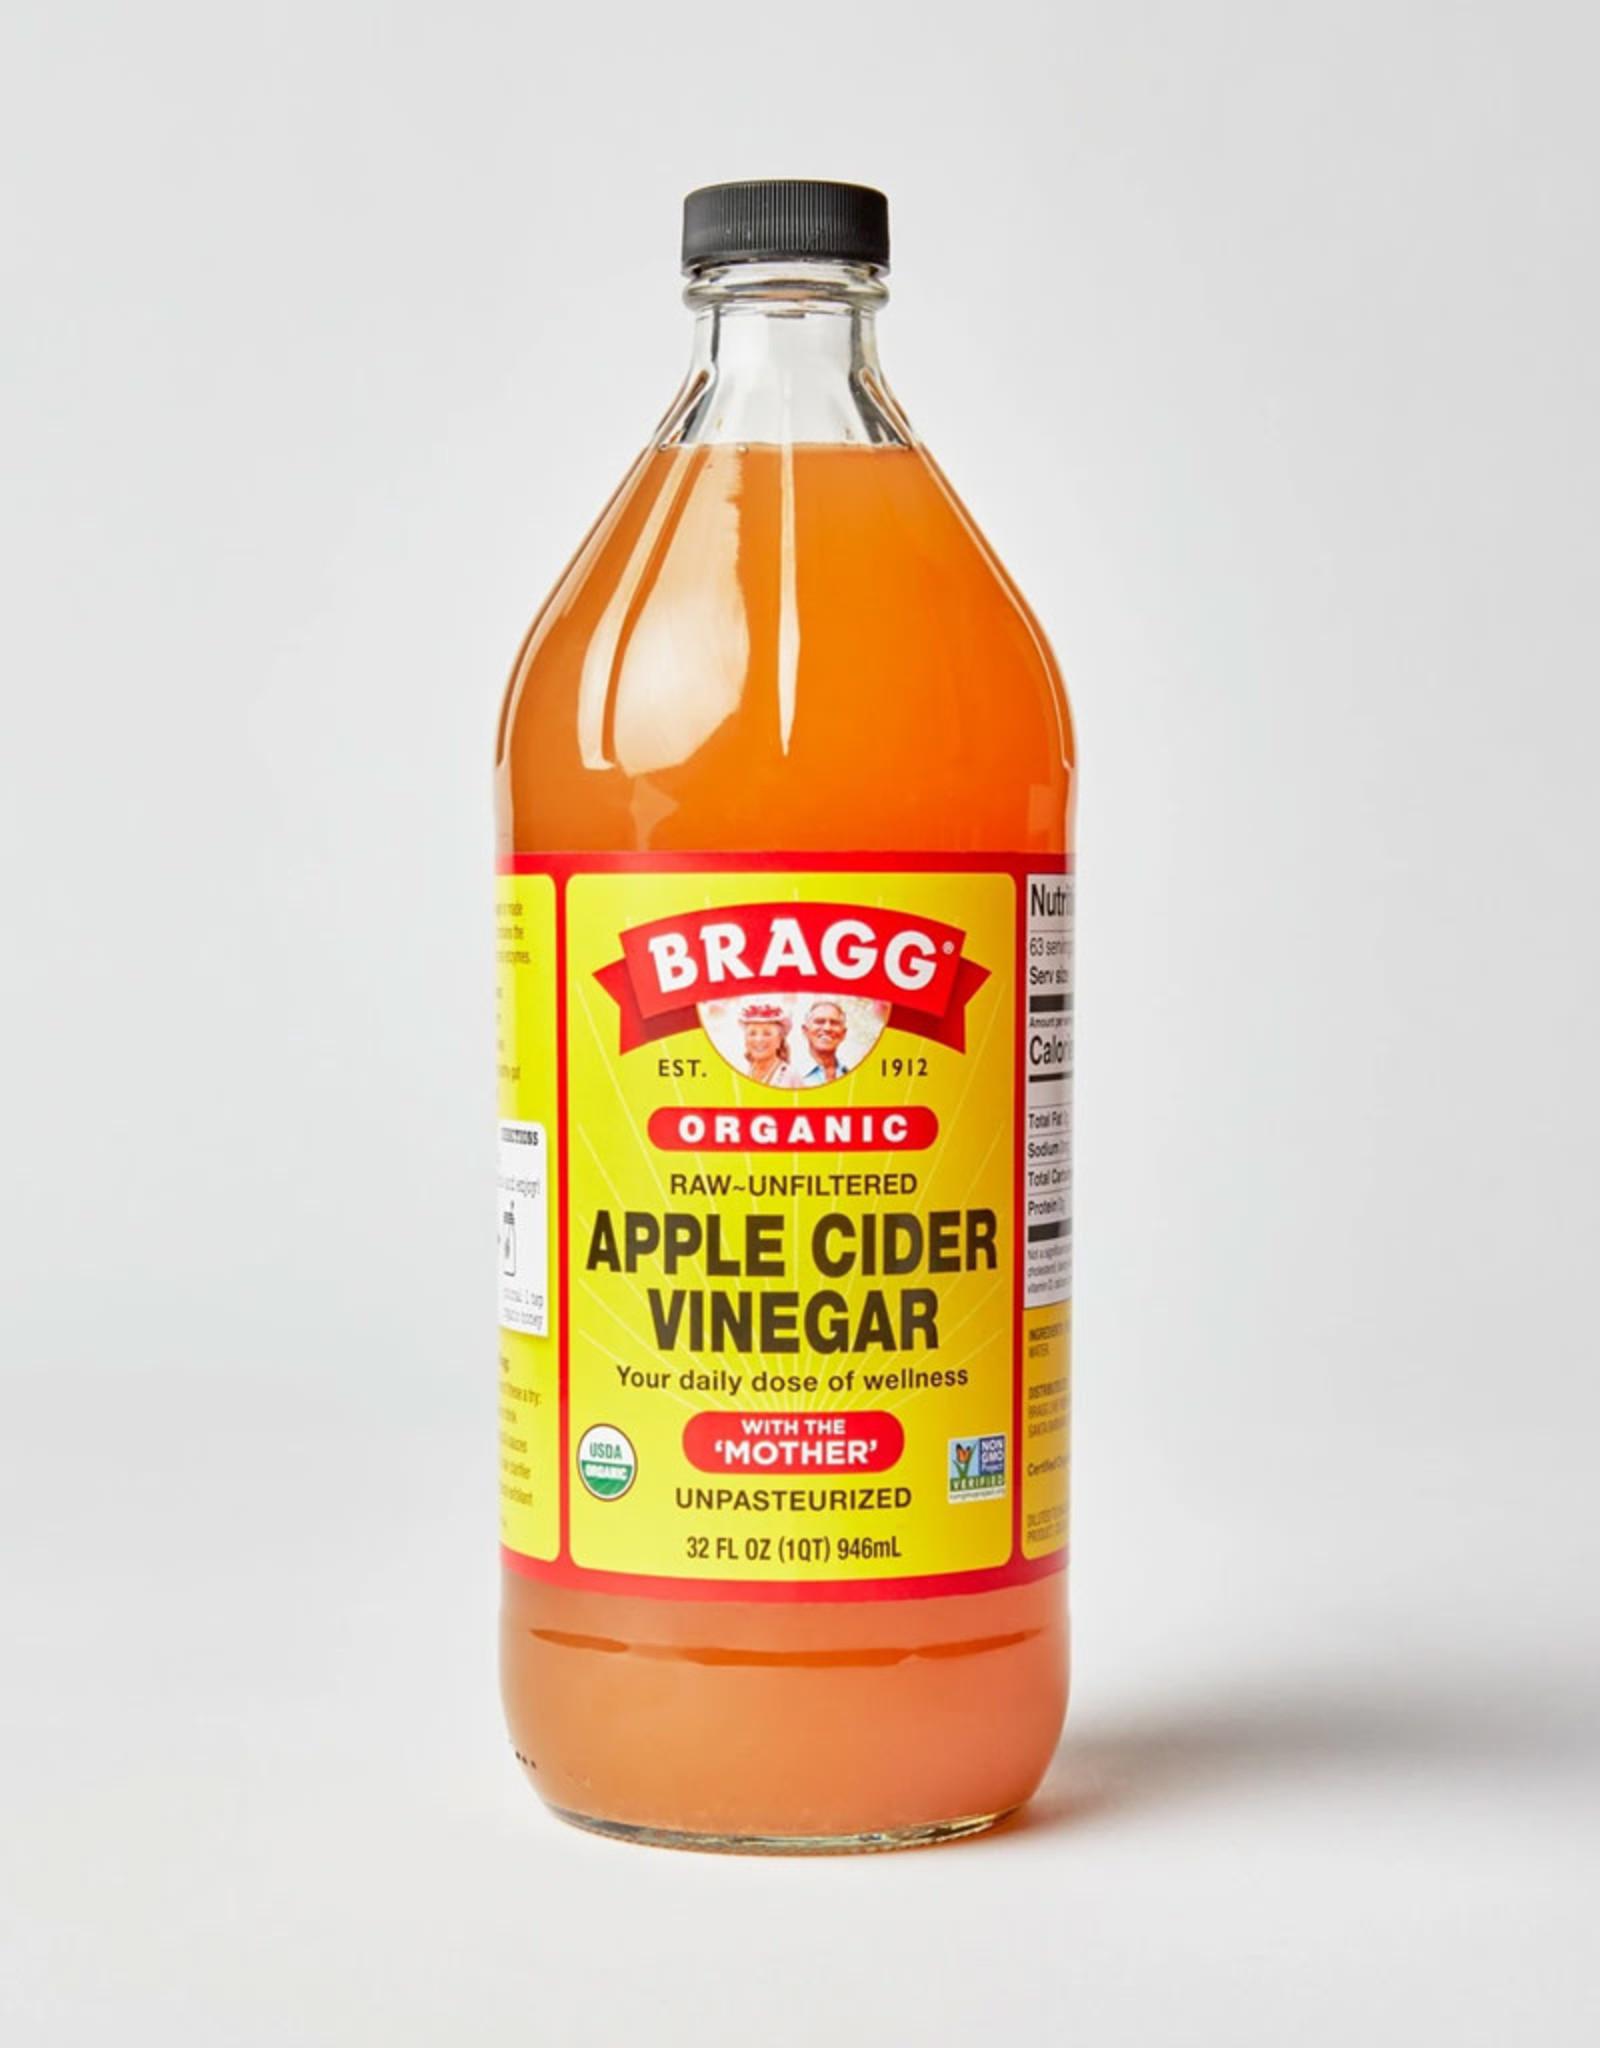 Bragg Bragg - Apple Cider Vinegar, Raw Unfiltered (946ml)